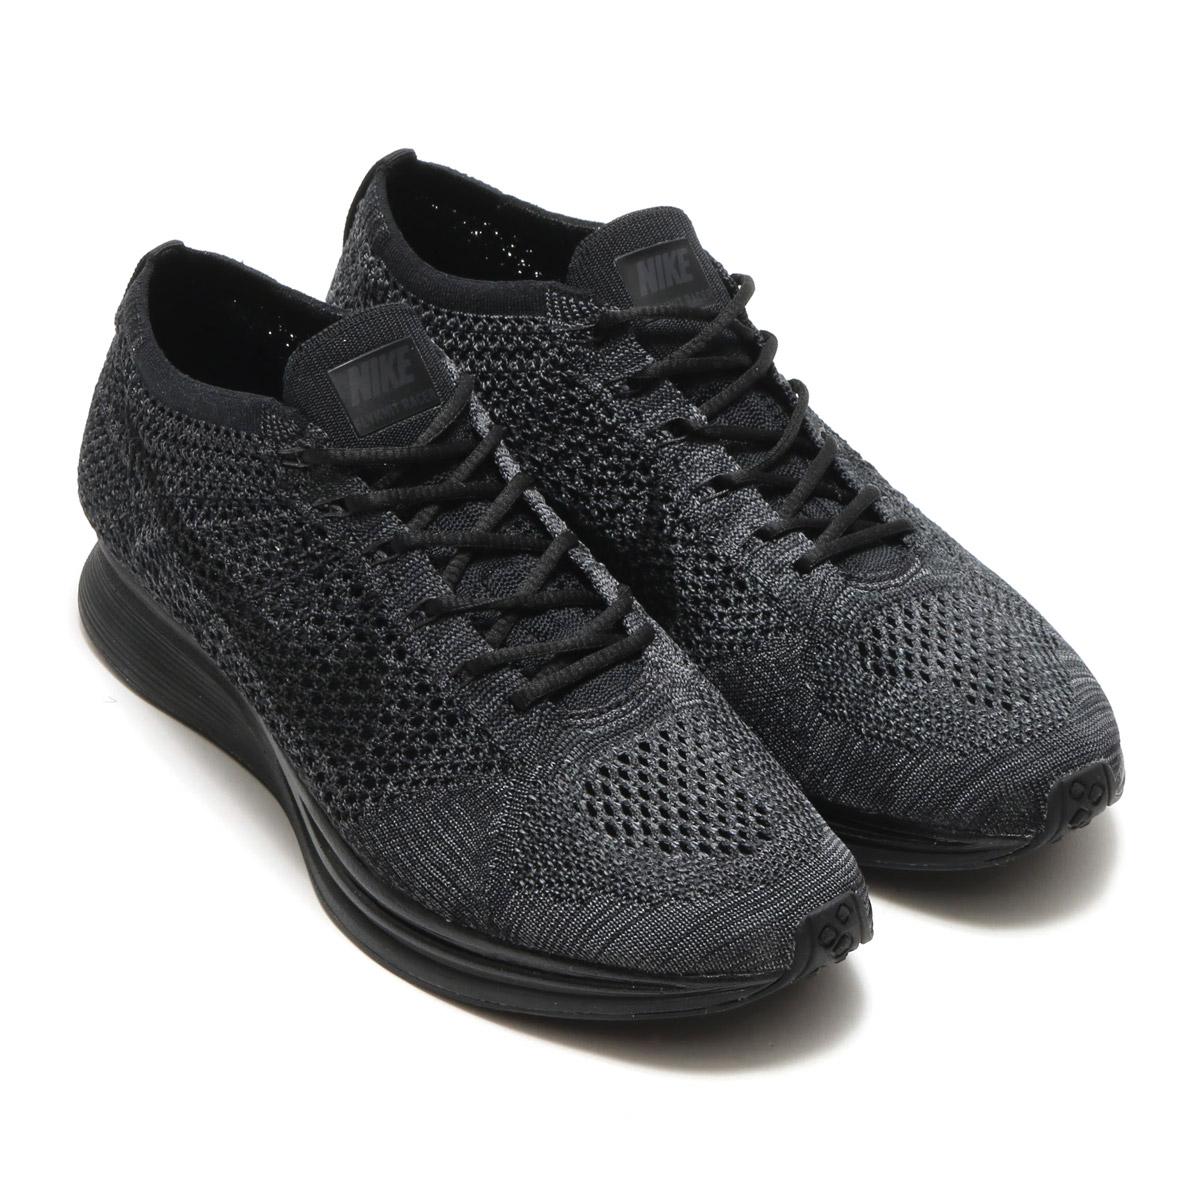 3f991629be40f2 NIKE FLYKNIT RACER (Nike fried food knit racer) (BLACK BLACK-ANTHRACITE)  17FW-I